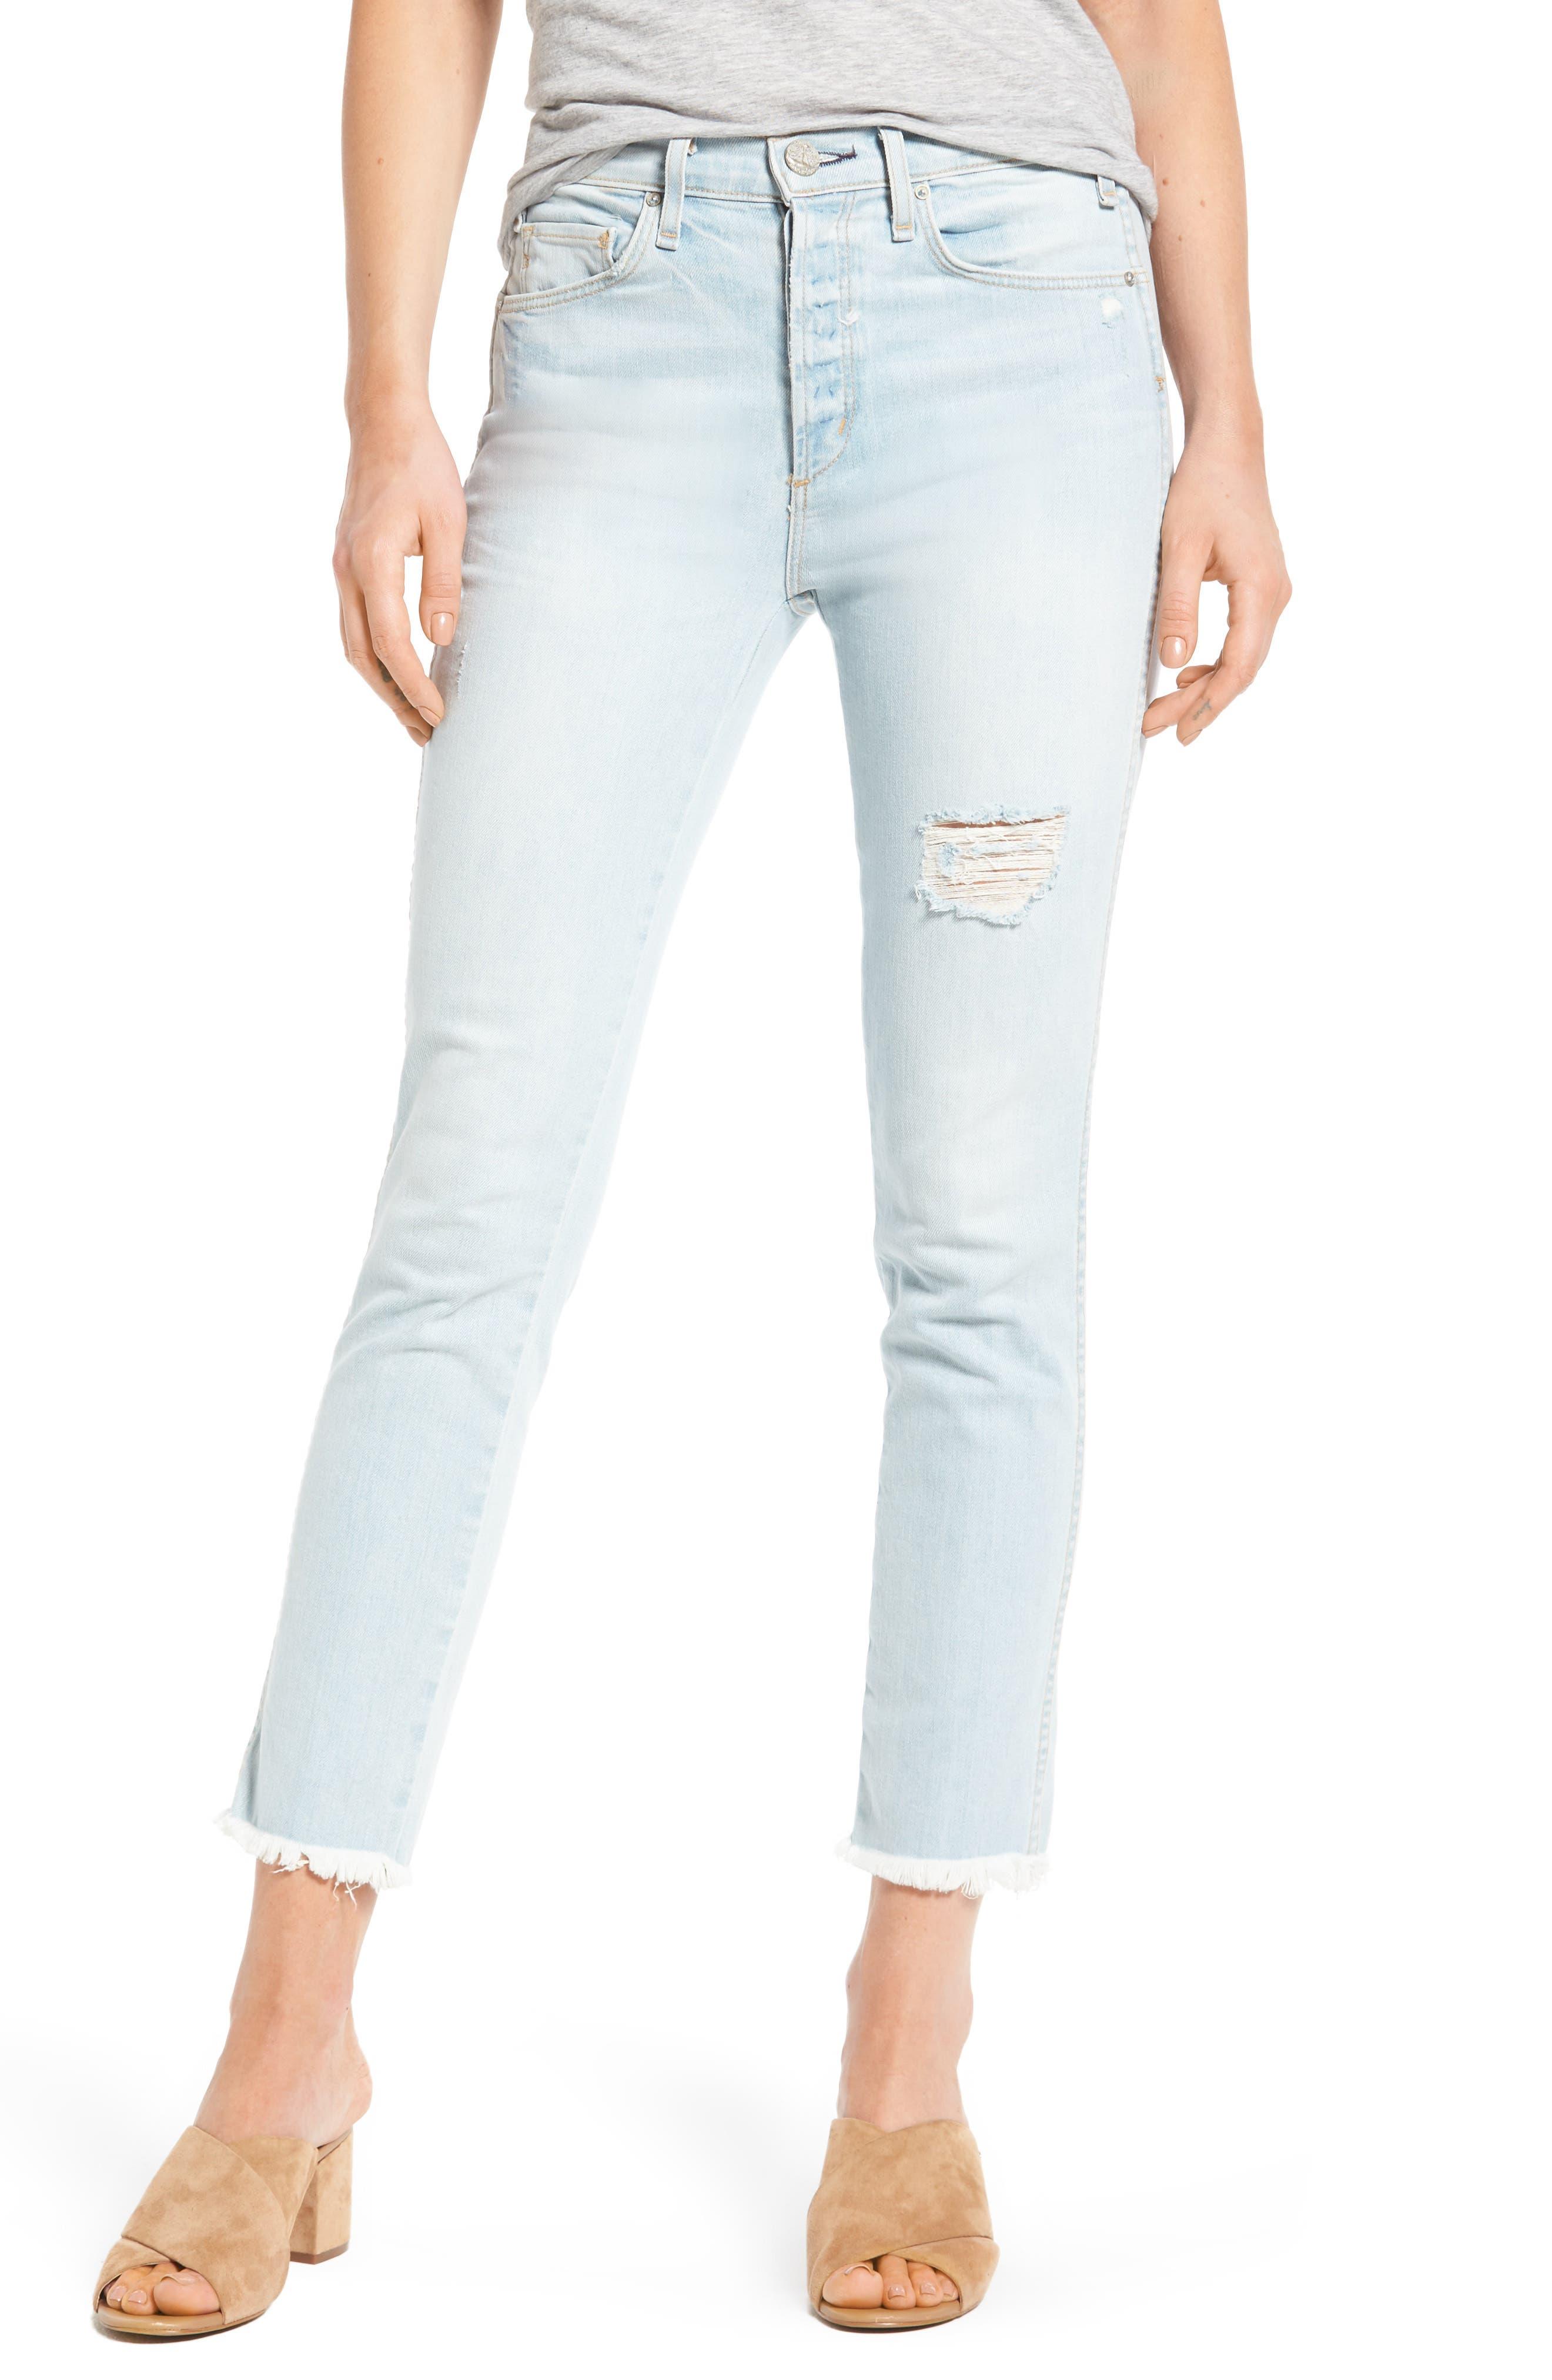 McGuire High Waist Crop Slim Jeans (Beach Slang)